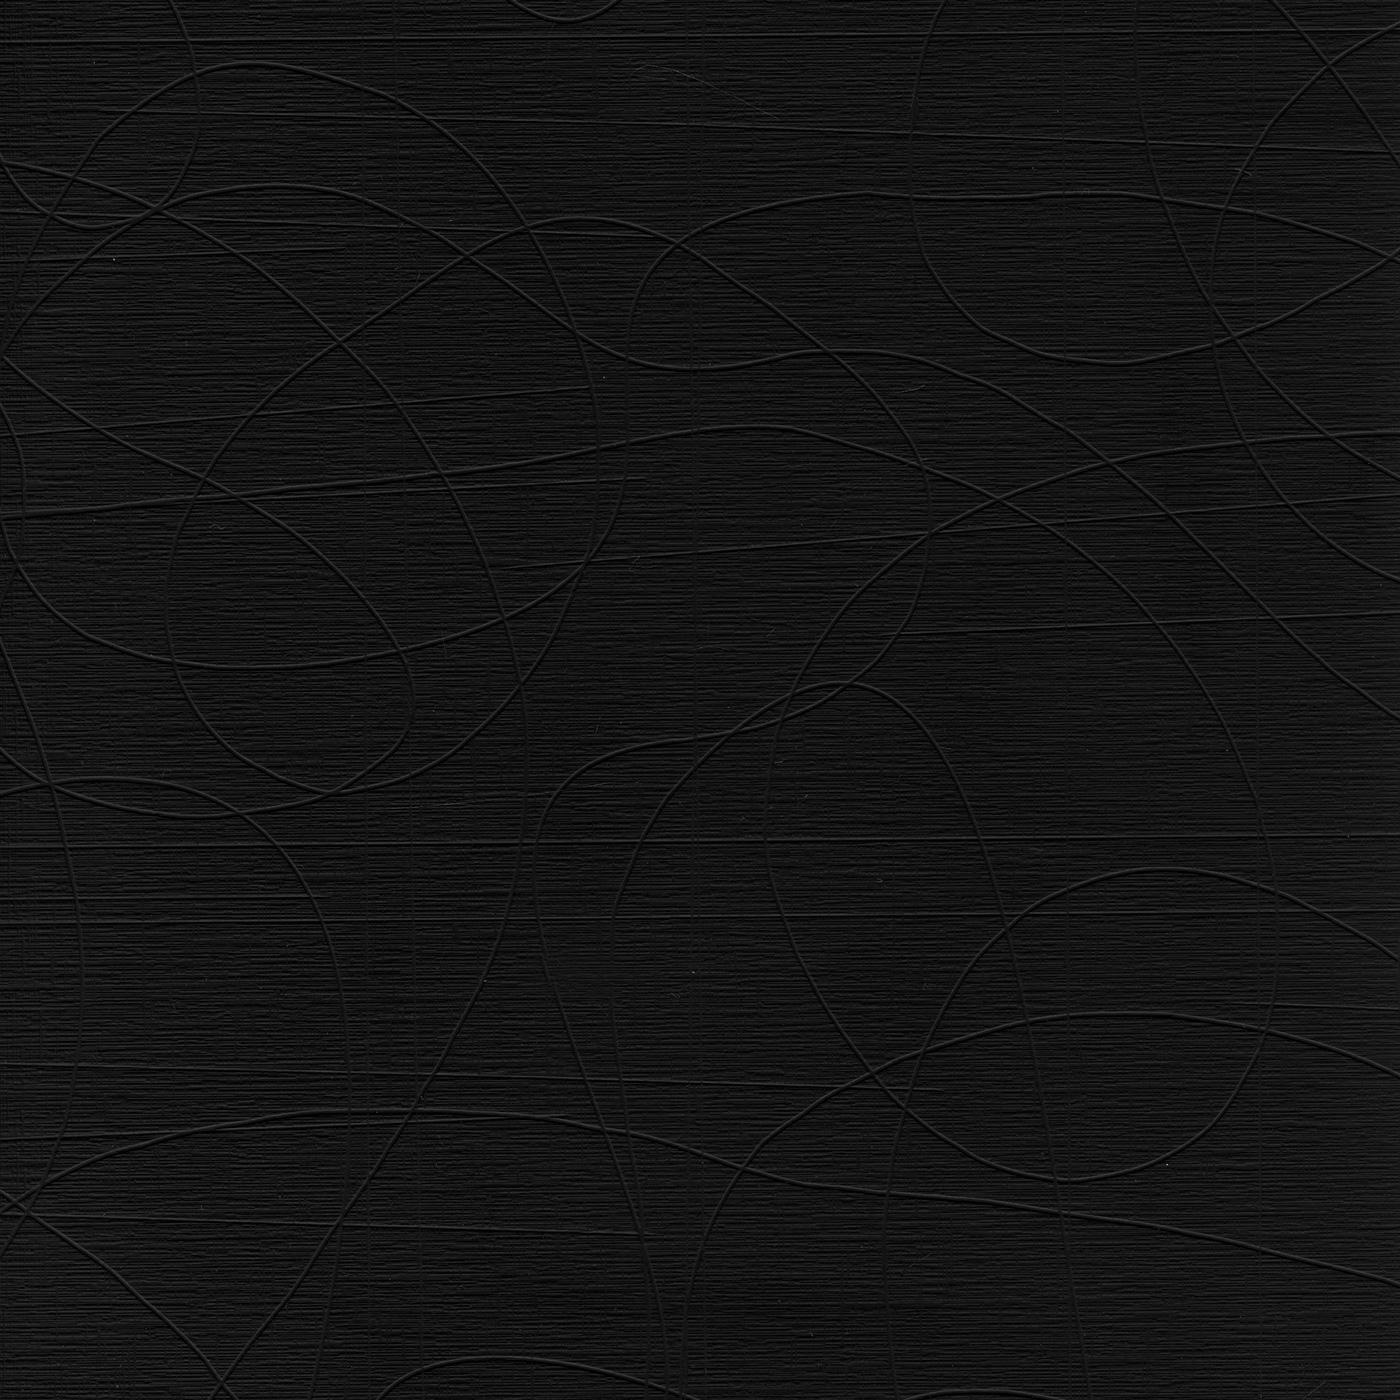 black - photo #31